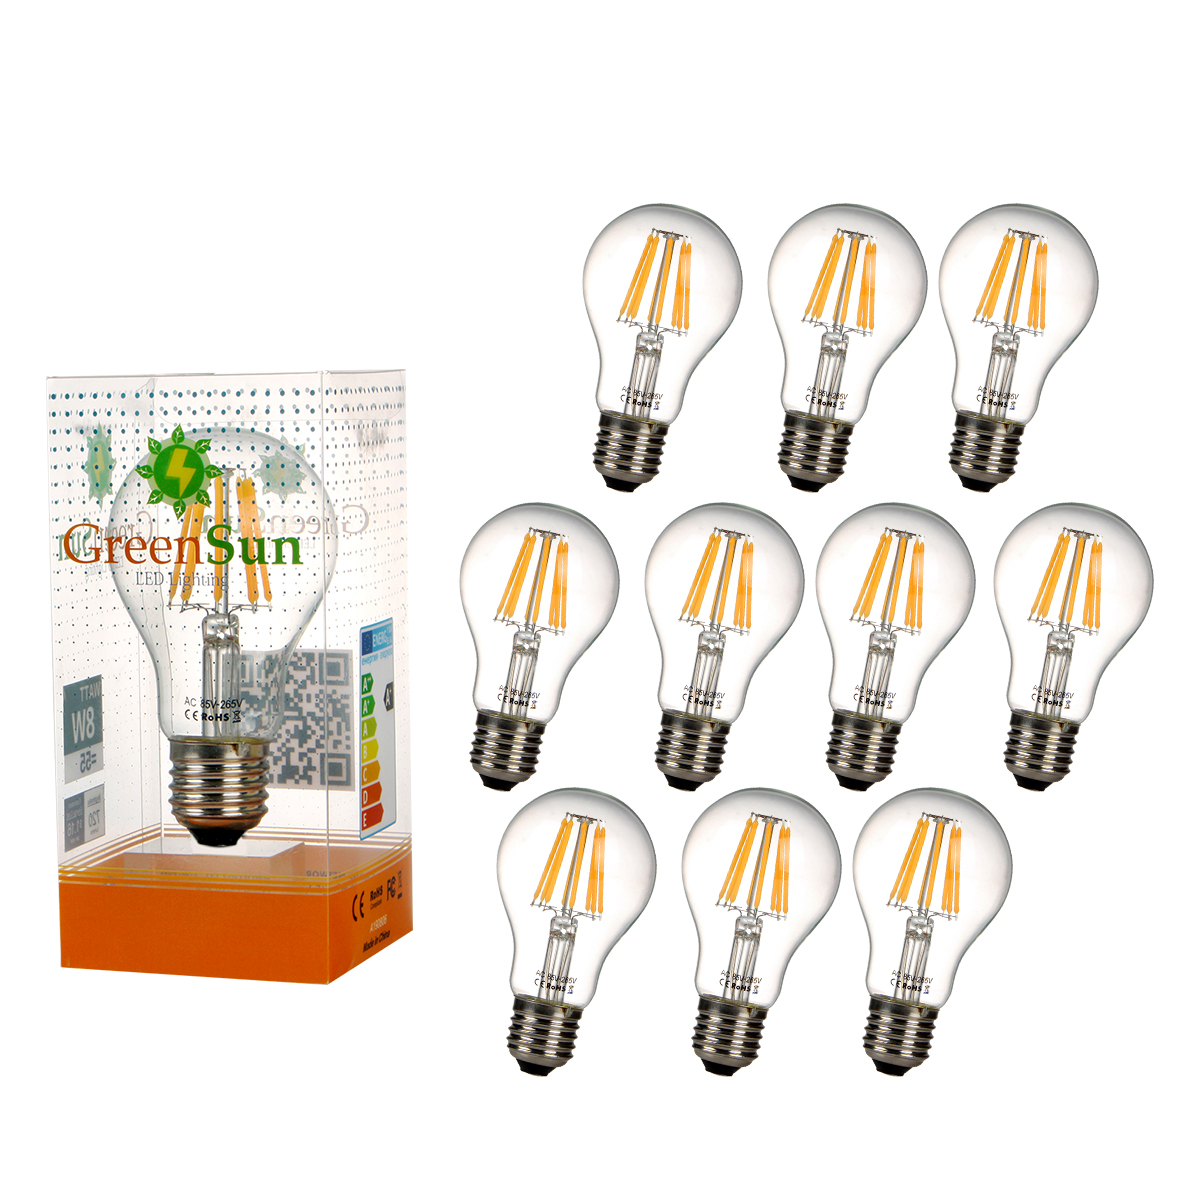 10Pcs E27 8W Edison Filament Warm White LED Energy Saving Bulb Light Lamp smart bulb e27 7w led bulb energy saving lamp color changeable smart bulb led lighting for iphone android home bedroom lighitng